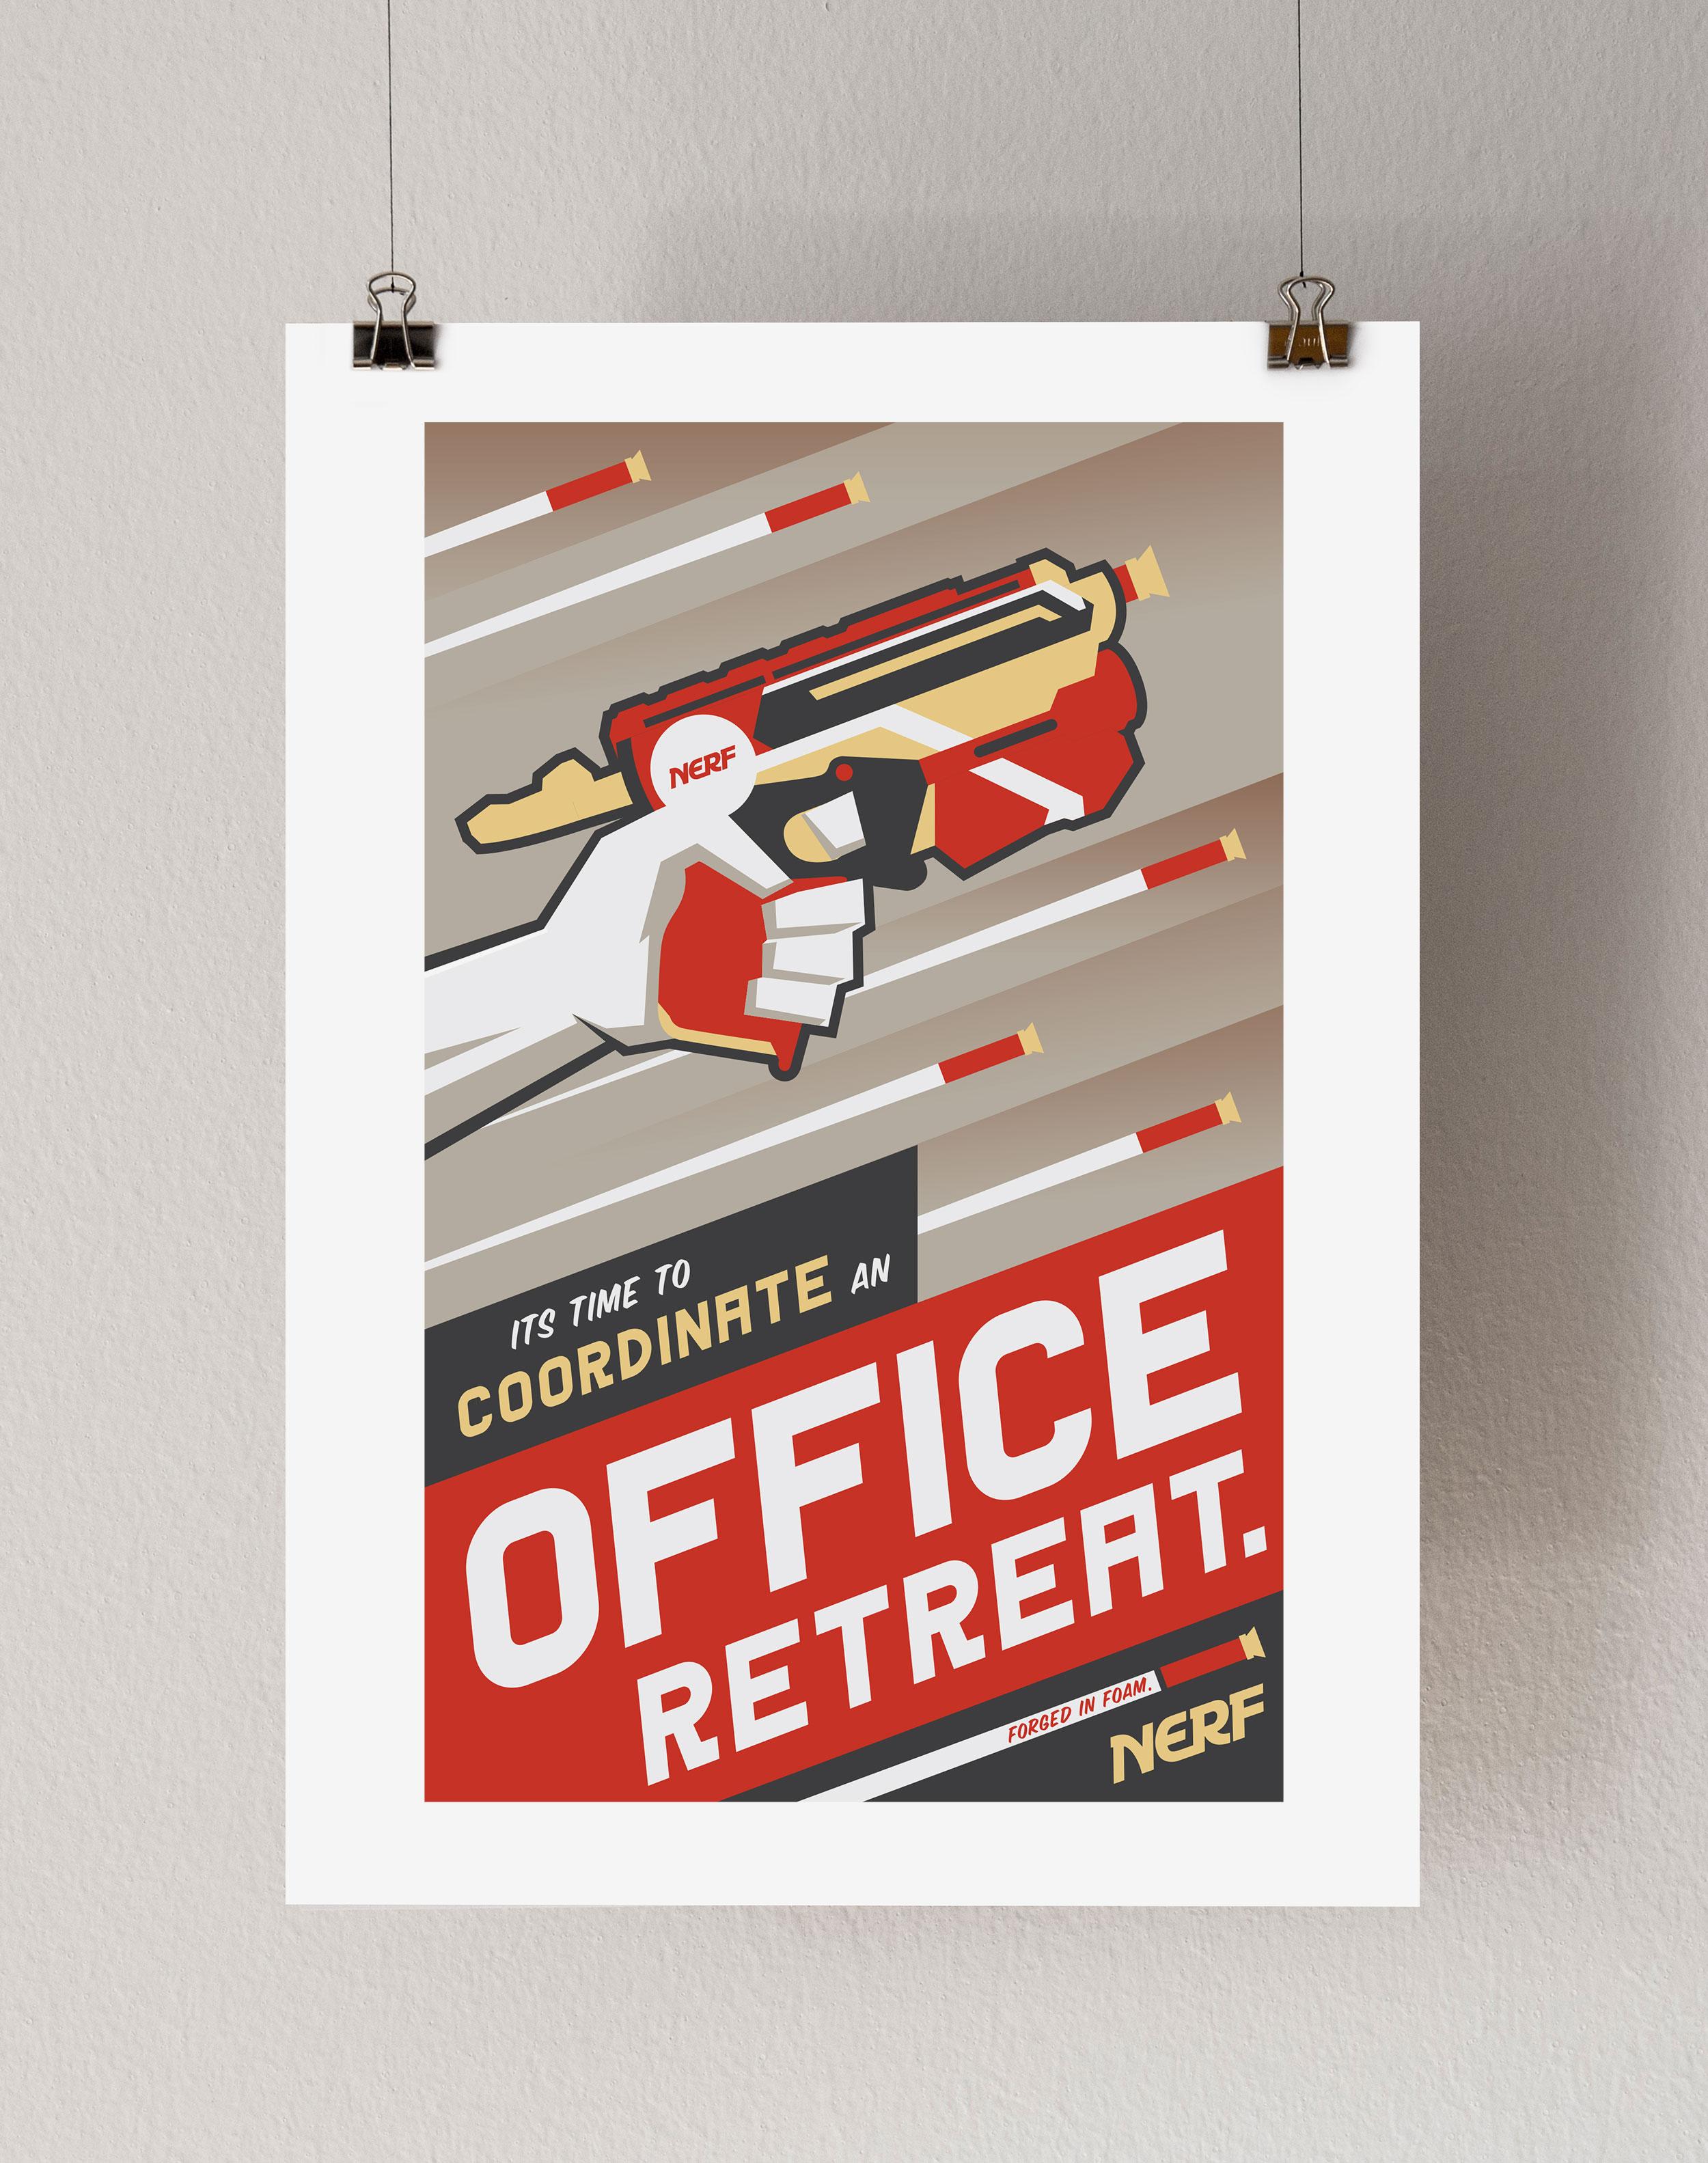 Illustrations_Posters_mockup_nerf2.jpg